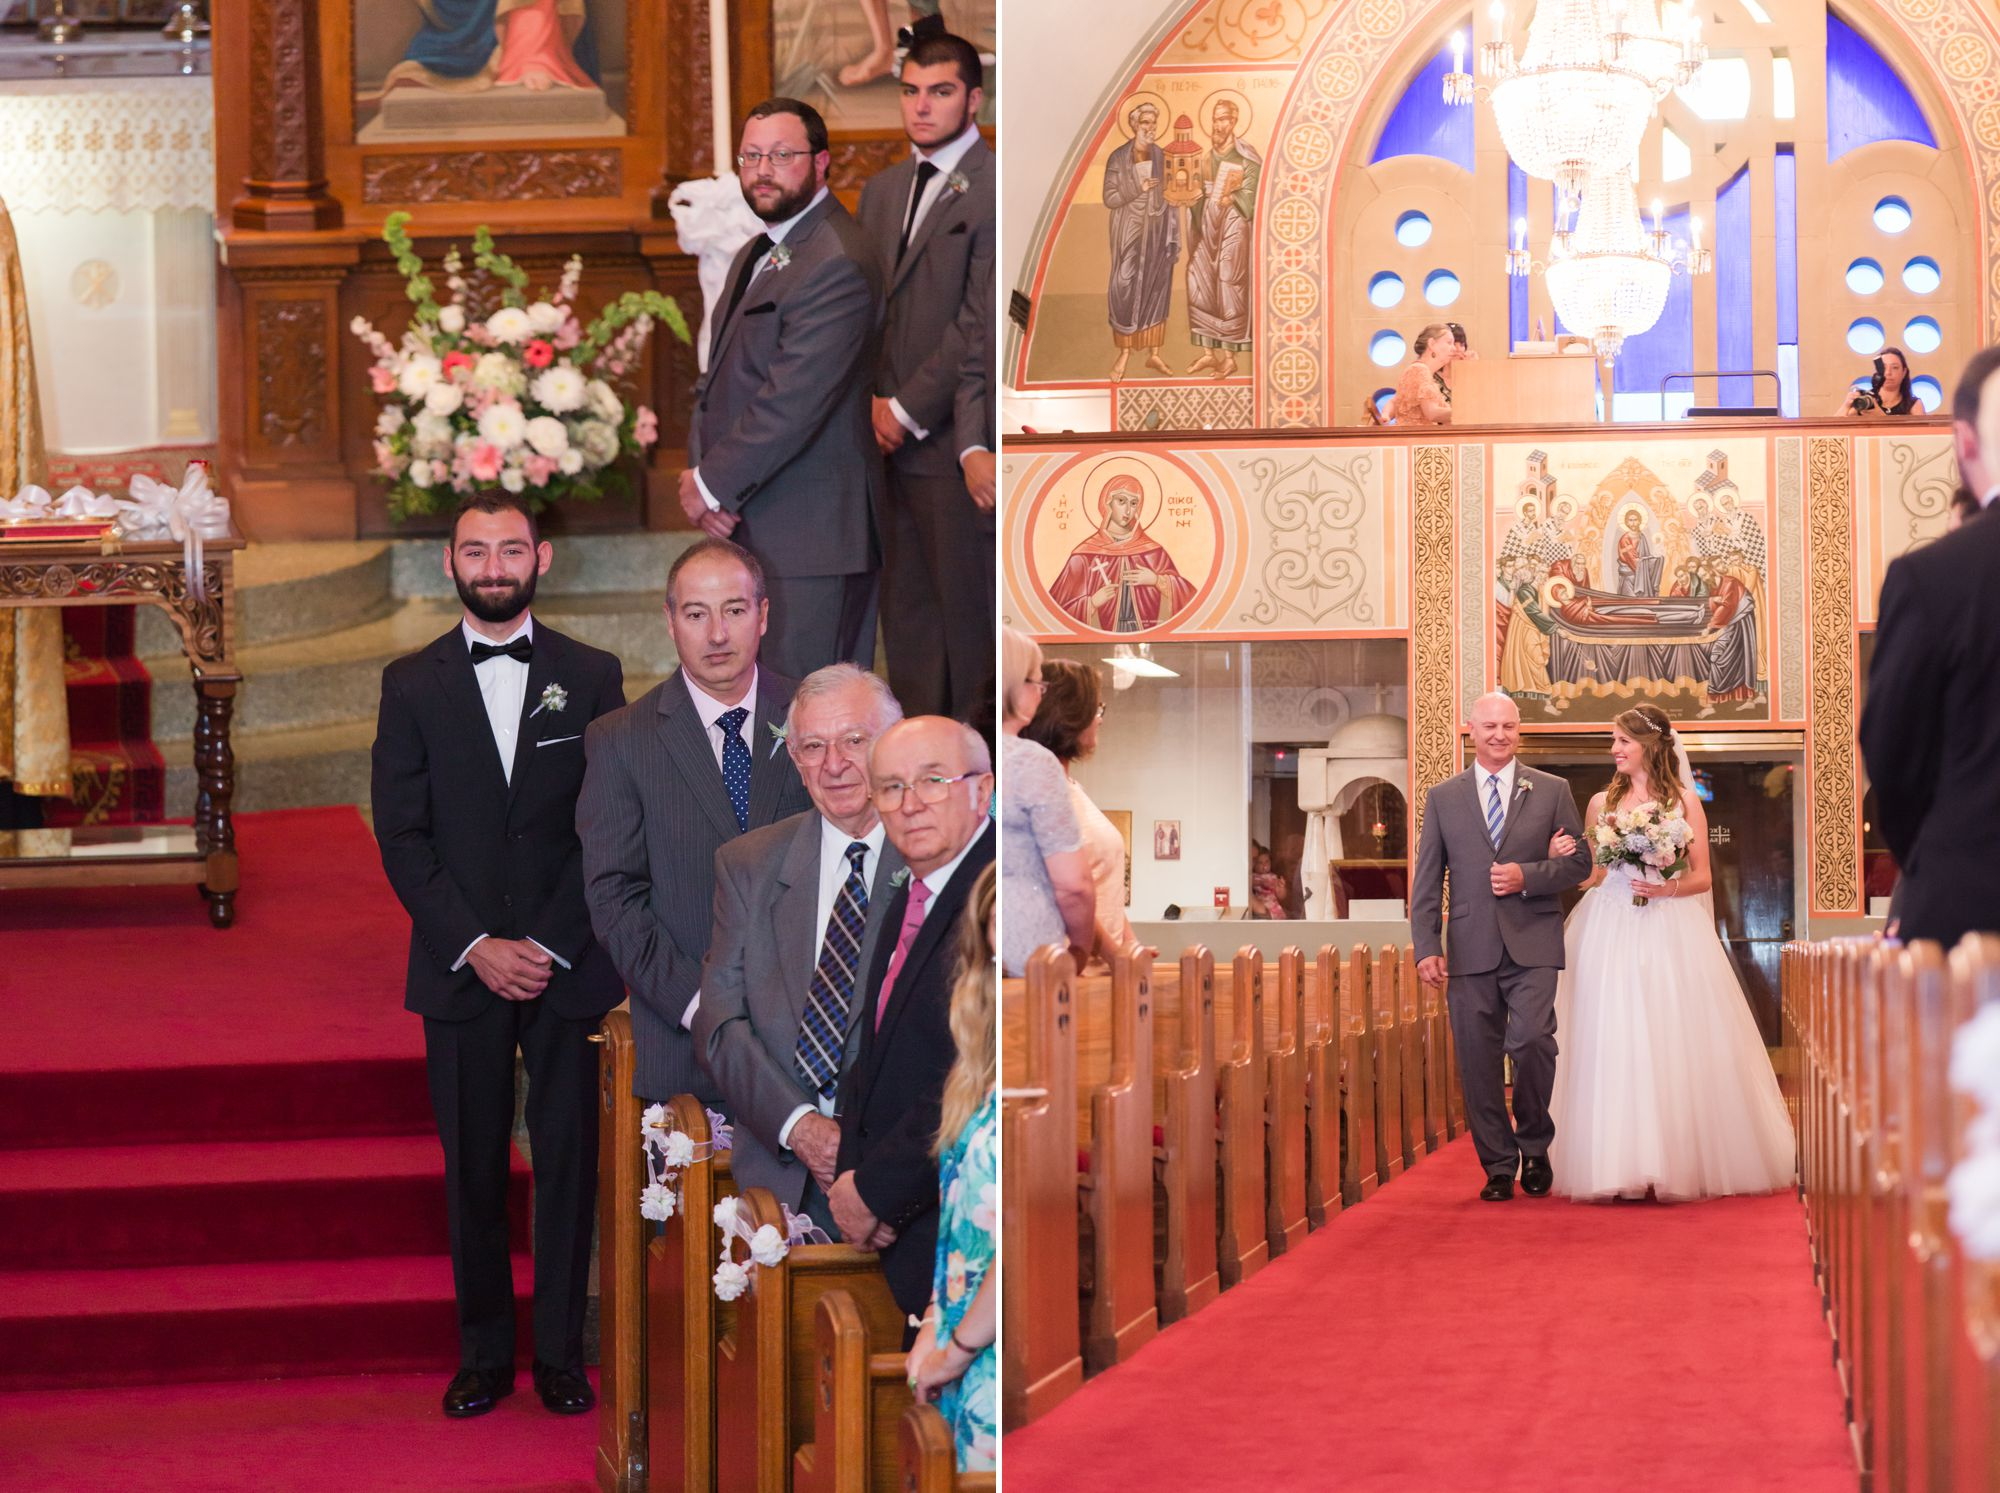 uptown-charlotte-orthodox-greek-wedding 53